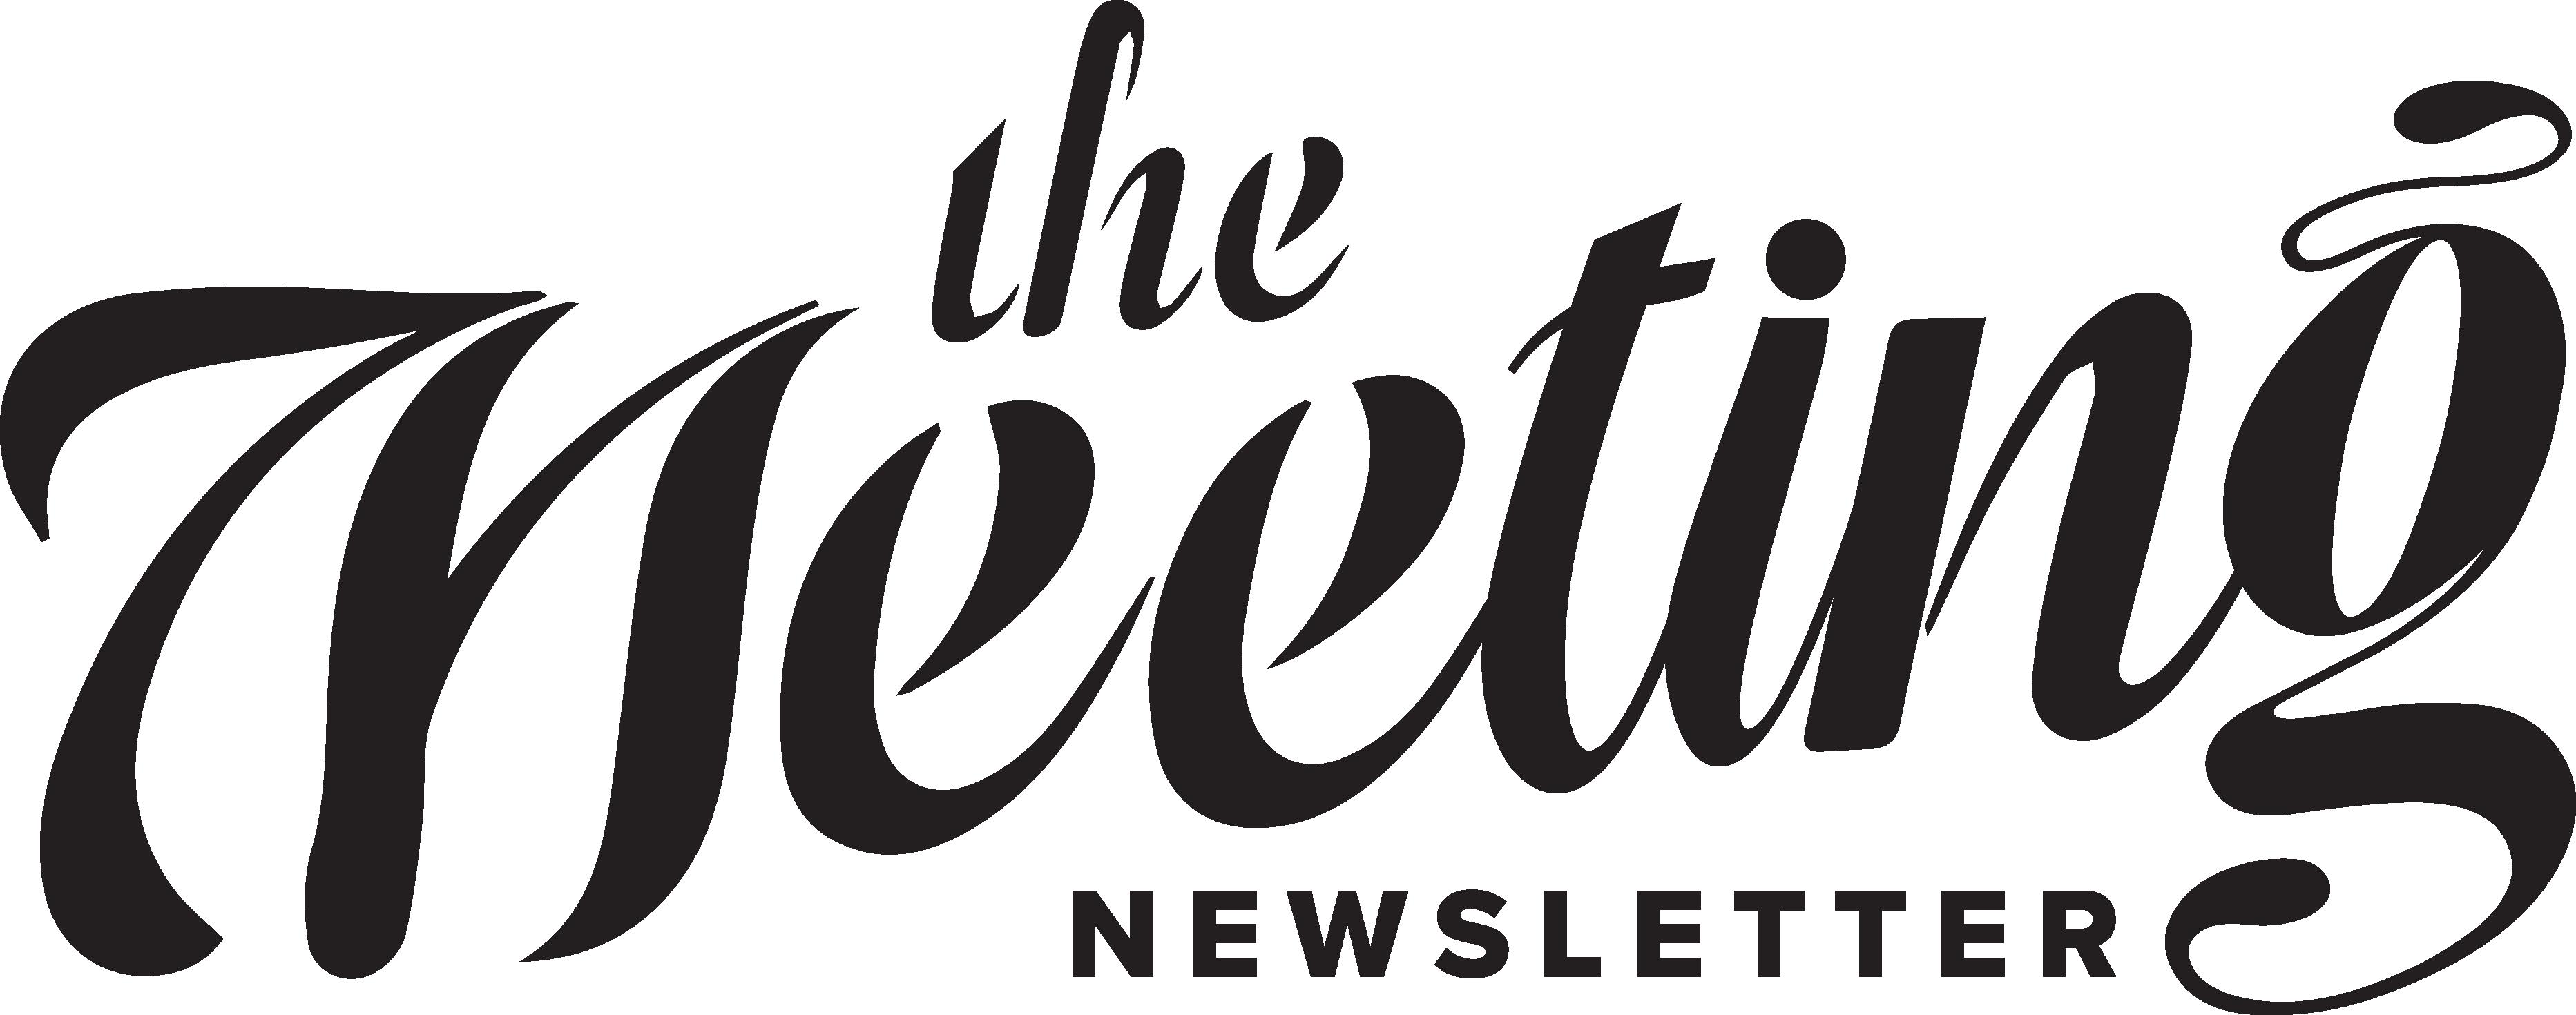 the weekeed